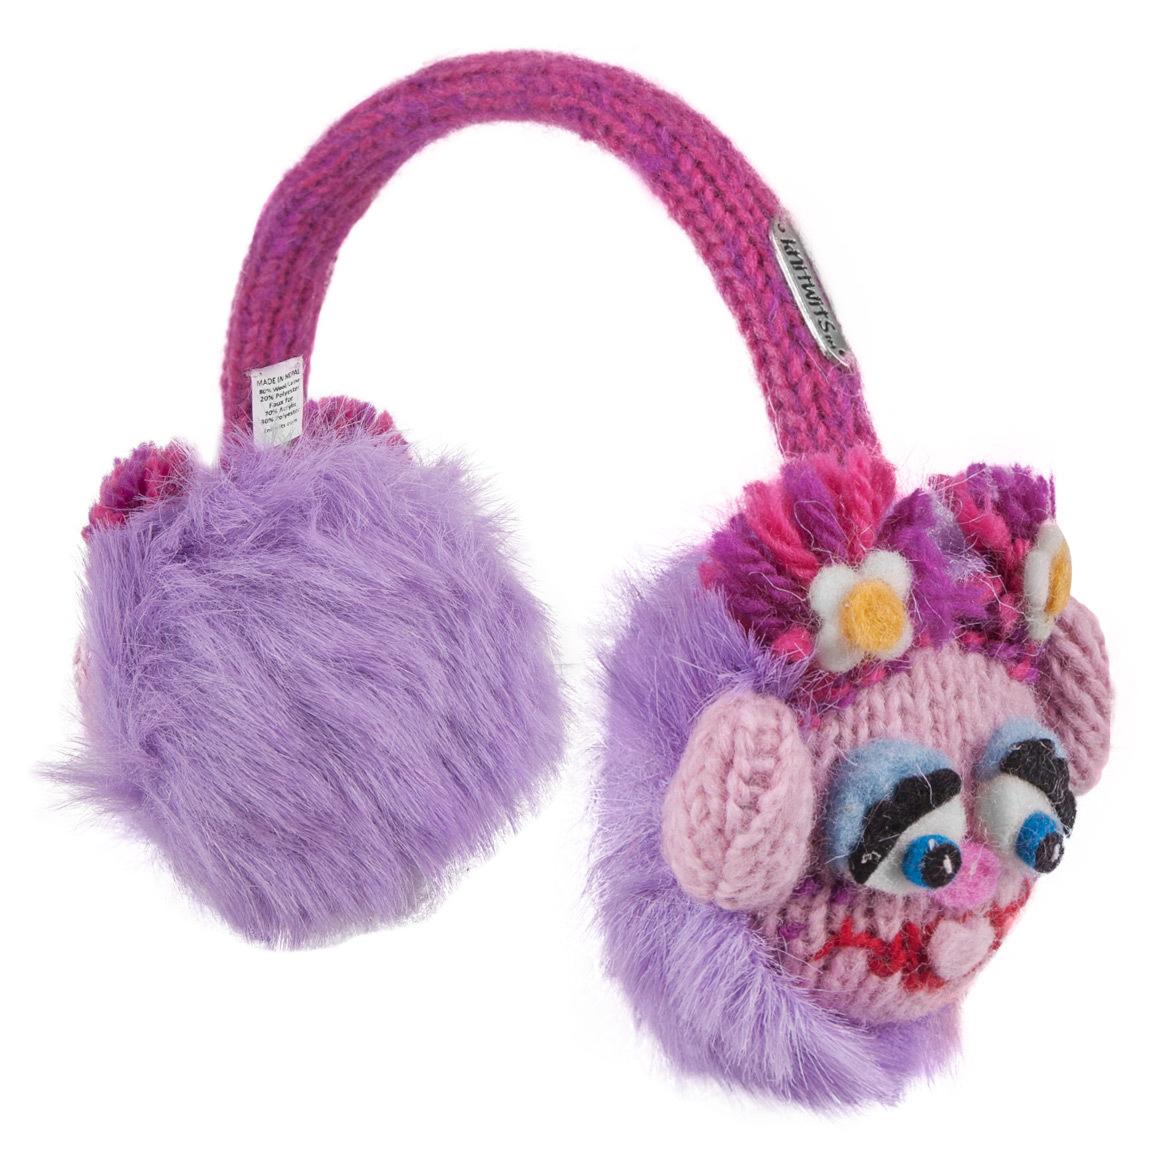 Sesame Street Abby Cadabby Knit Earmuffs